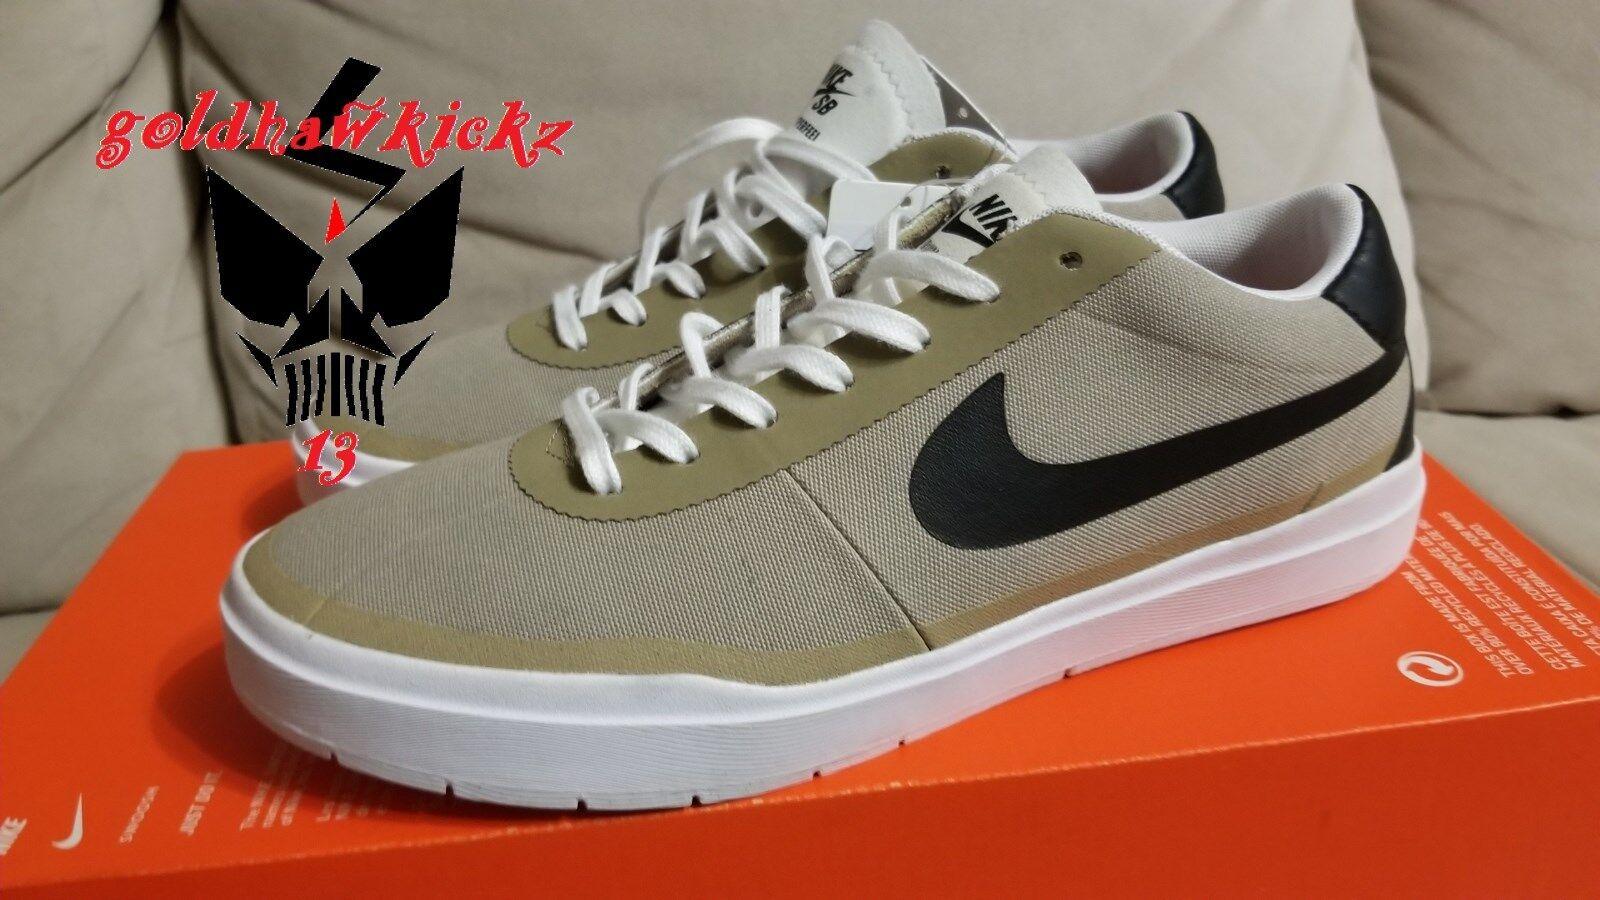 Nike sb bella hyperfeel cnvs tela cachi bianco nero 883680 201 skate - board